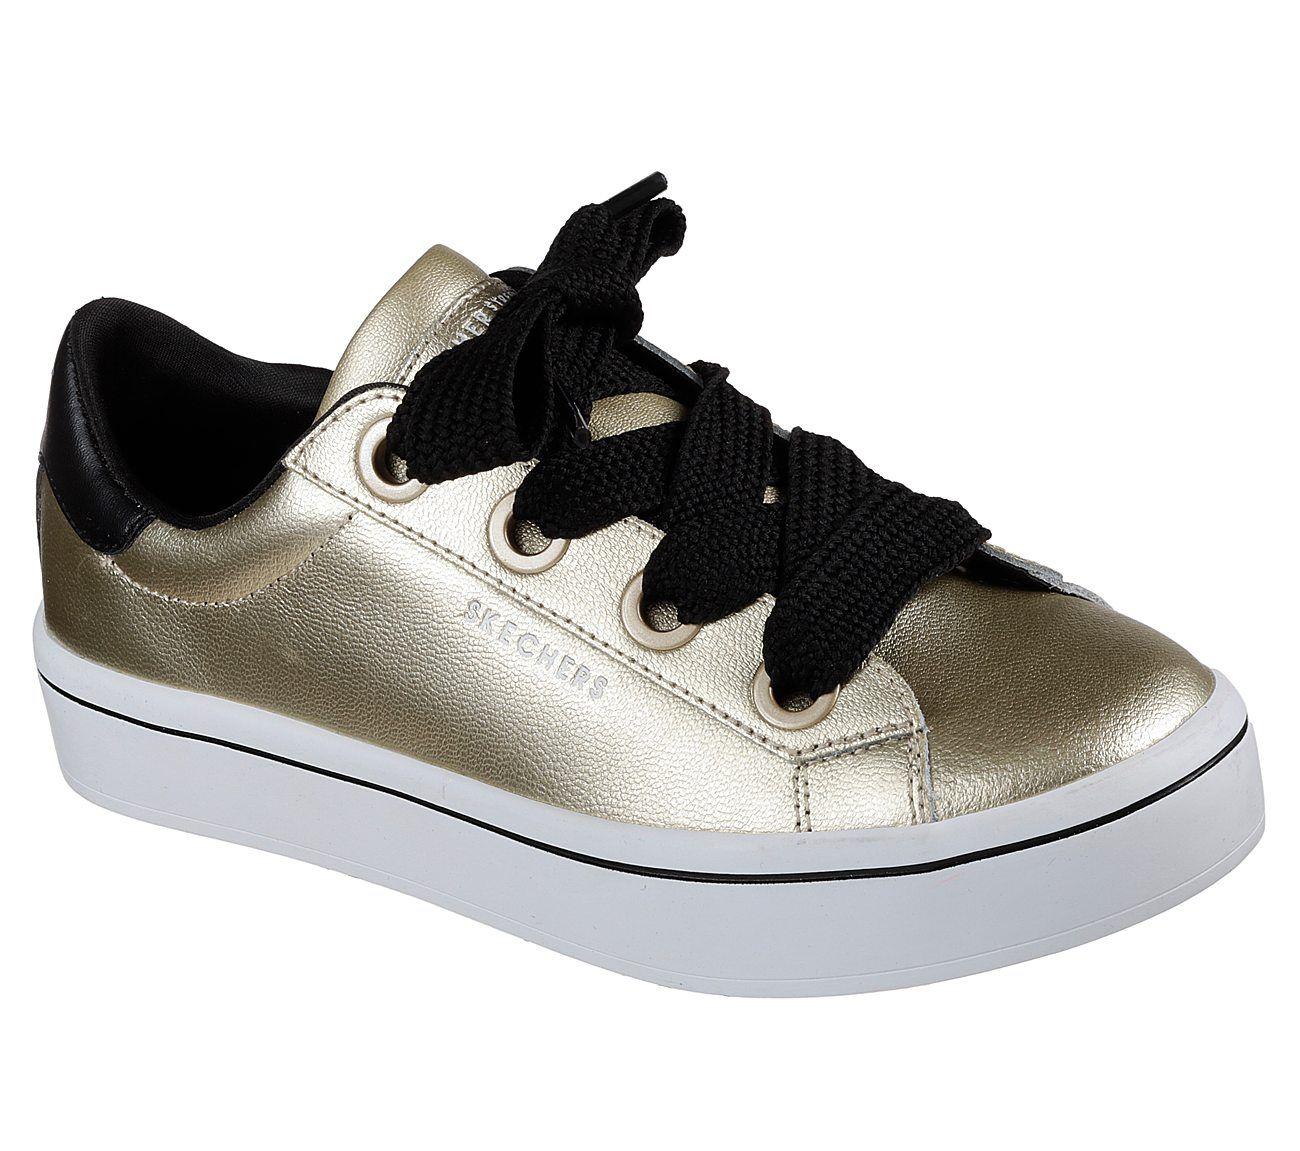 Shoes Shoes Hi Skechers Y Metallics Clothes Lites FqwEwv1